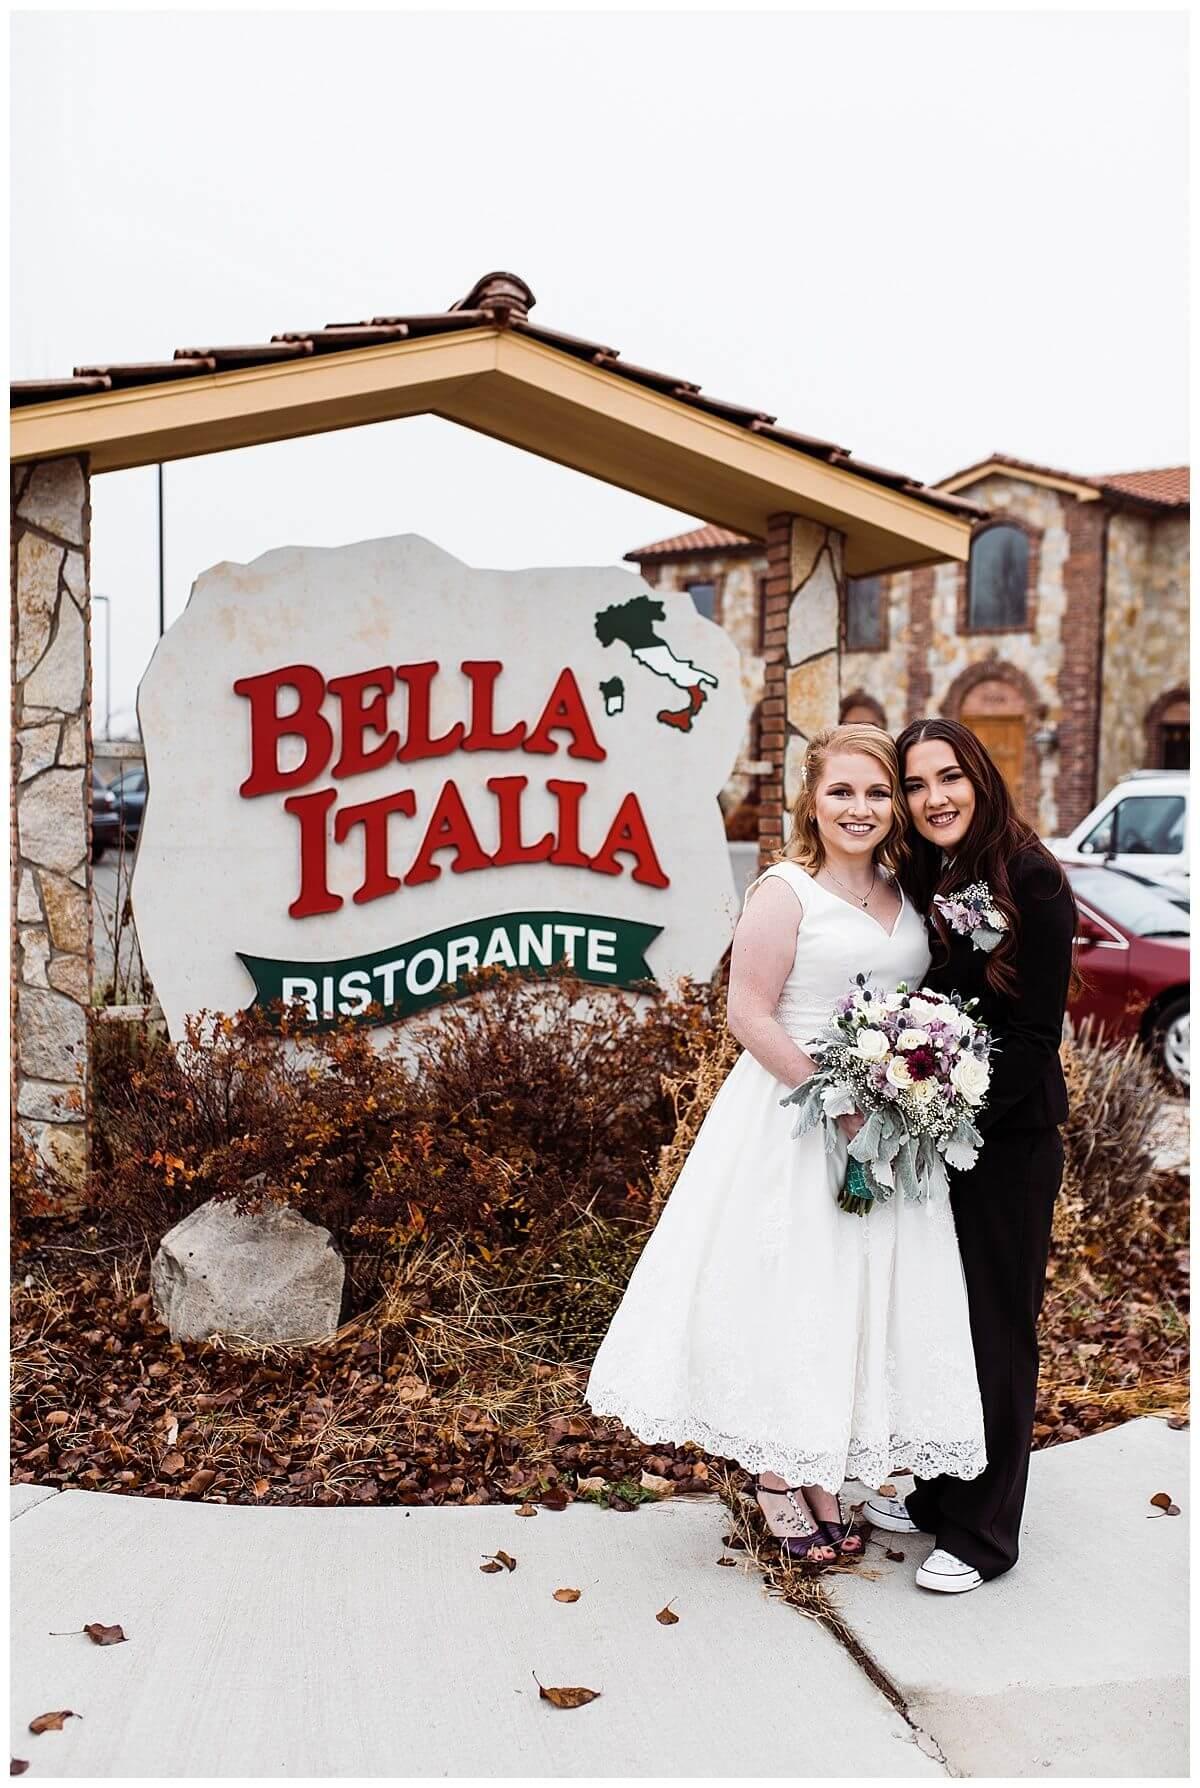 S Photography,adventure,bella italia,bride,kennewick,lesbian,lgbt,oregon,pacific northwest,photographer,same sex,washington,wedding,winter,